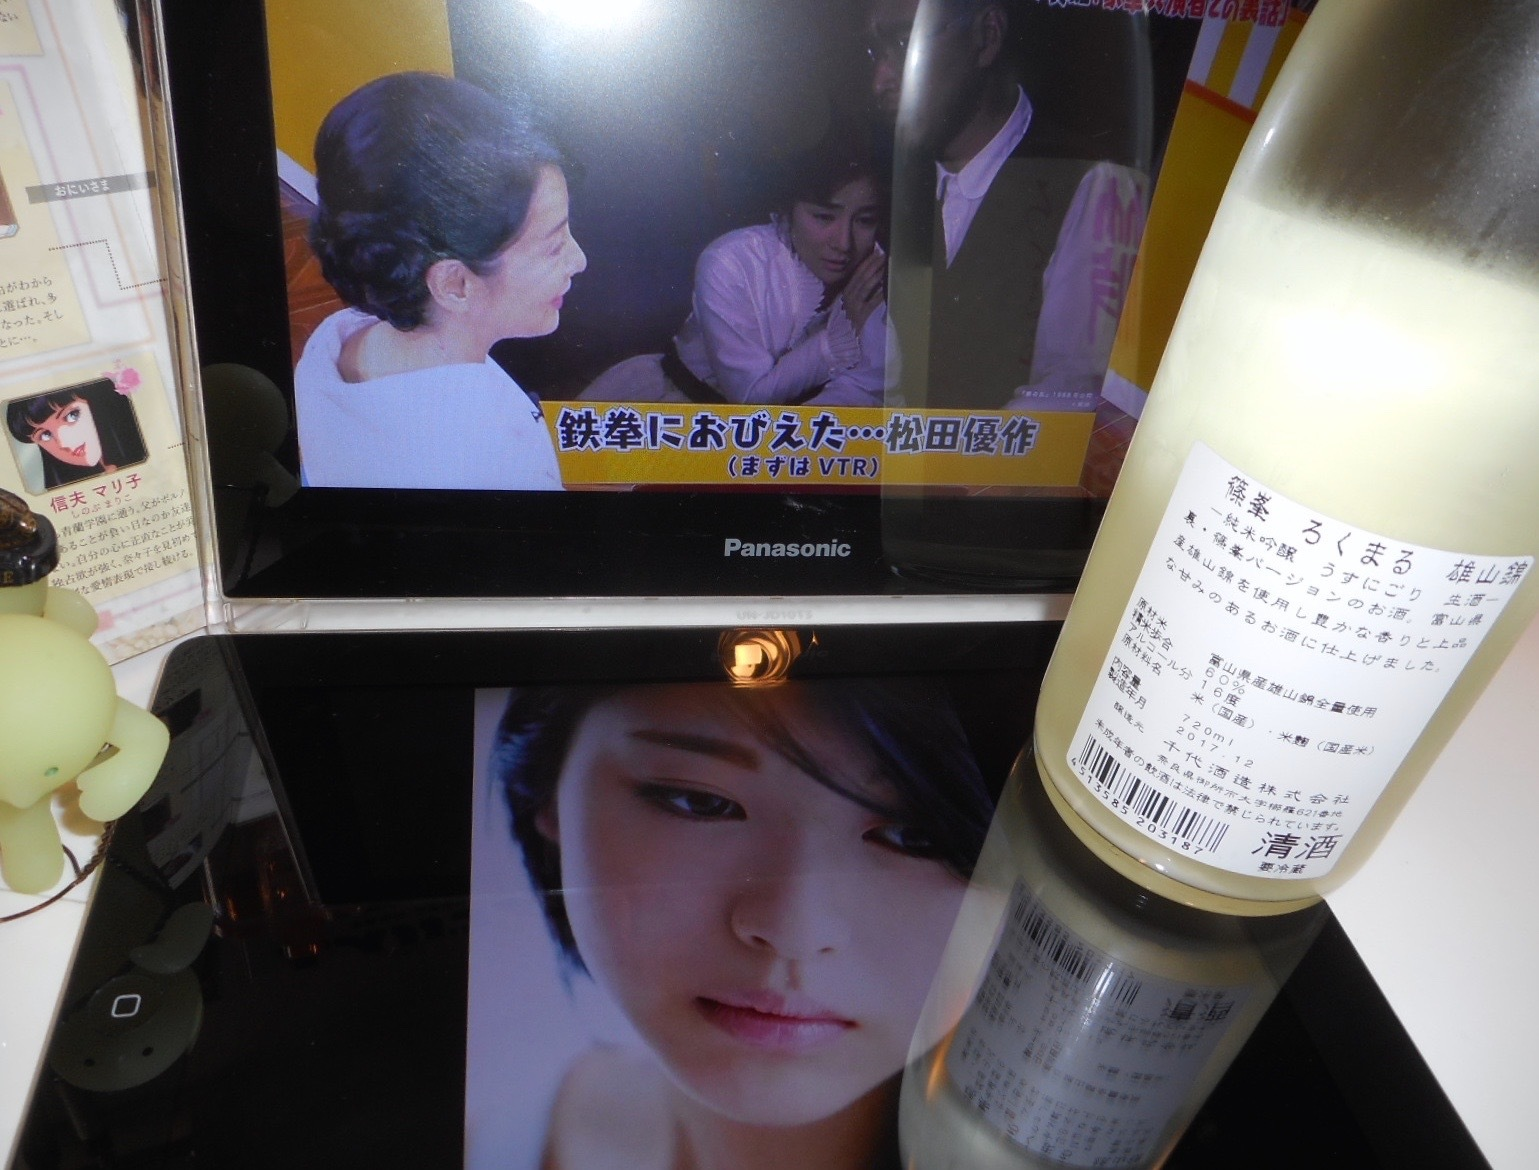 rokumaru_oyama_usunigori29by2.jpg